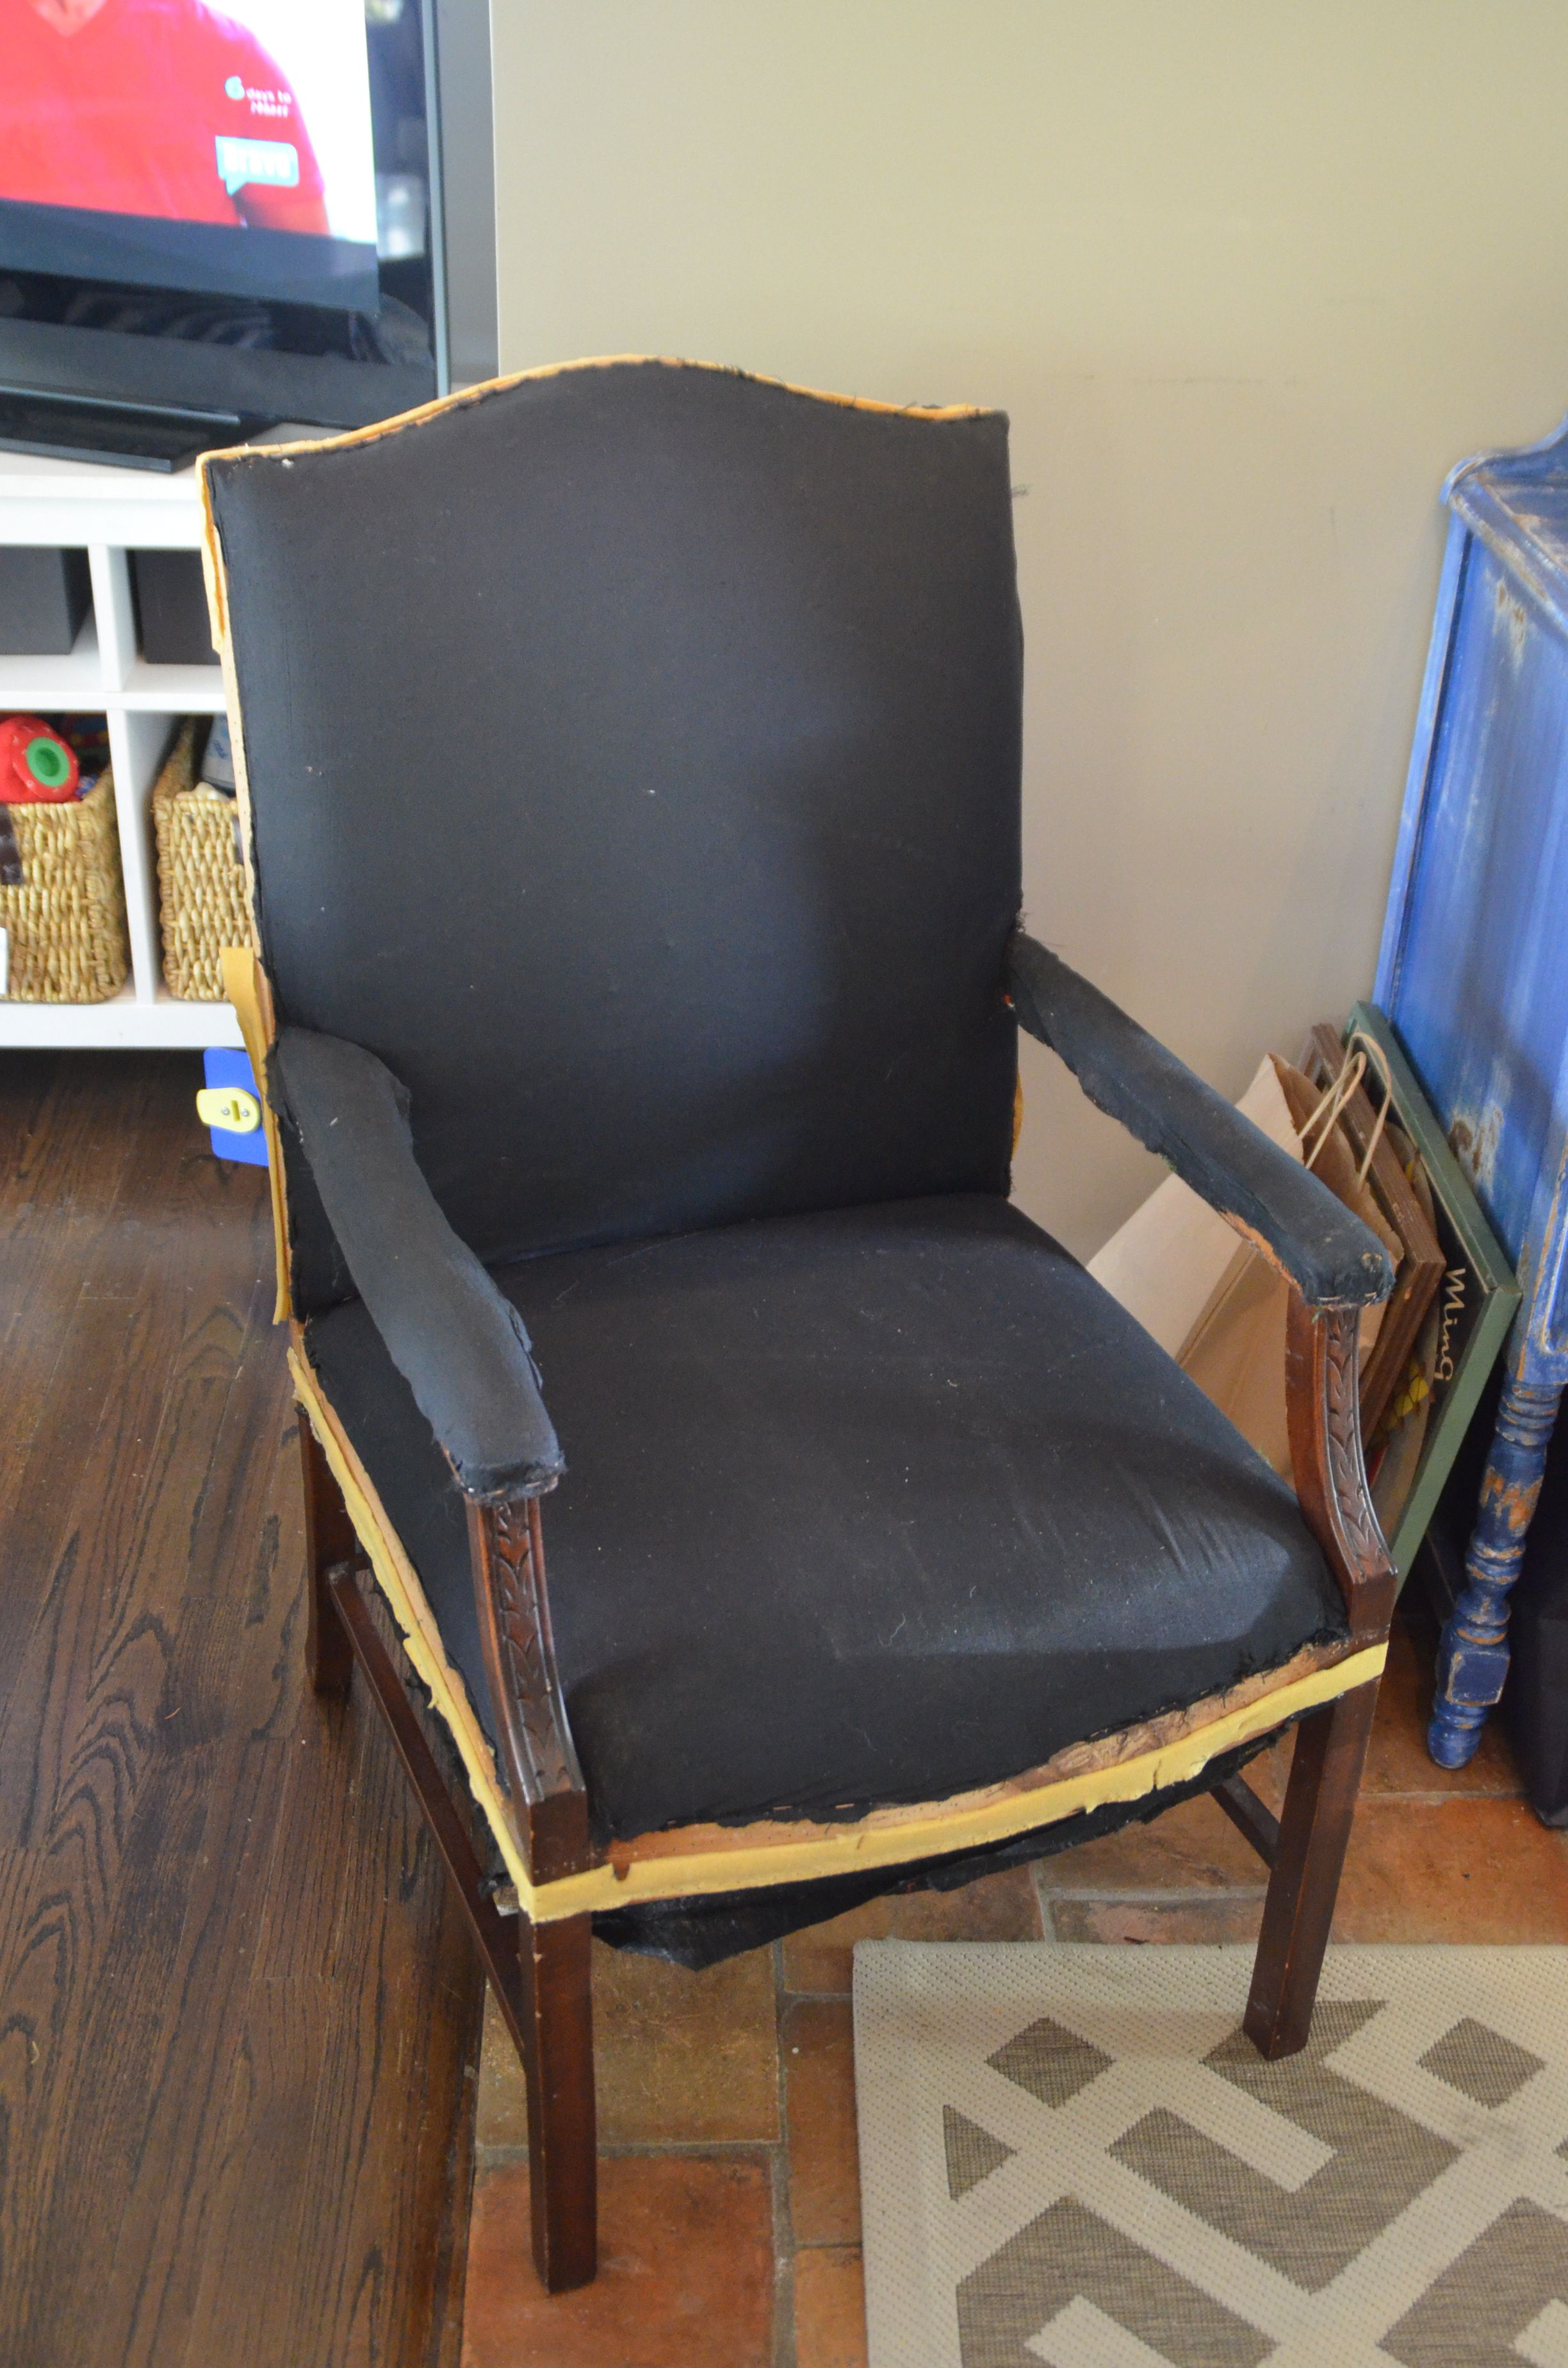 ikea, kilm, upholstery, chair, gimp, craigslist, foyer